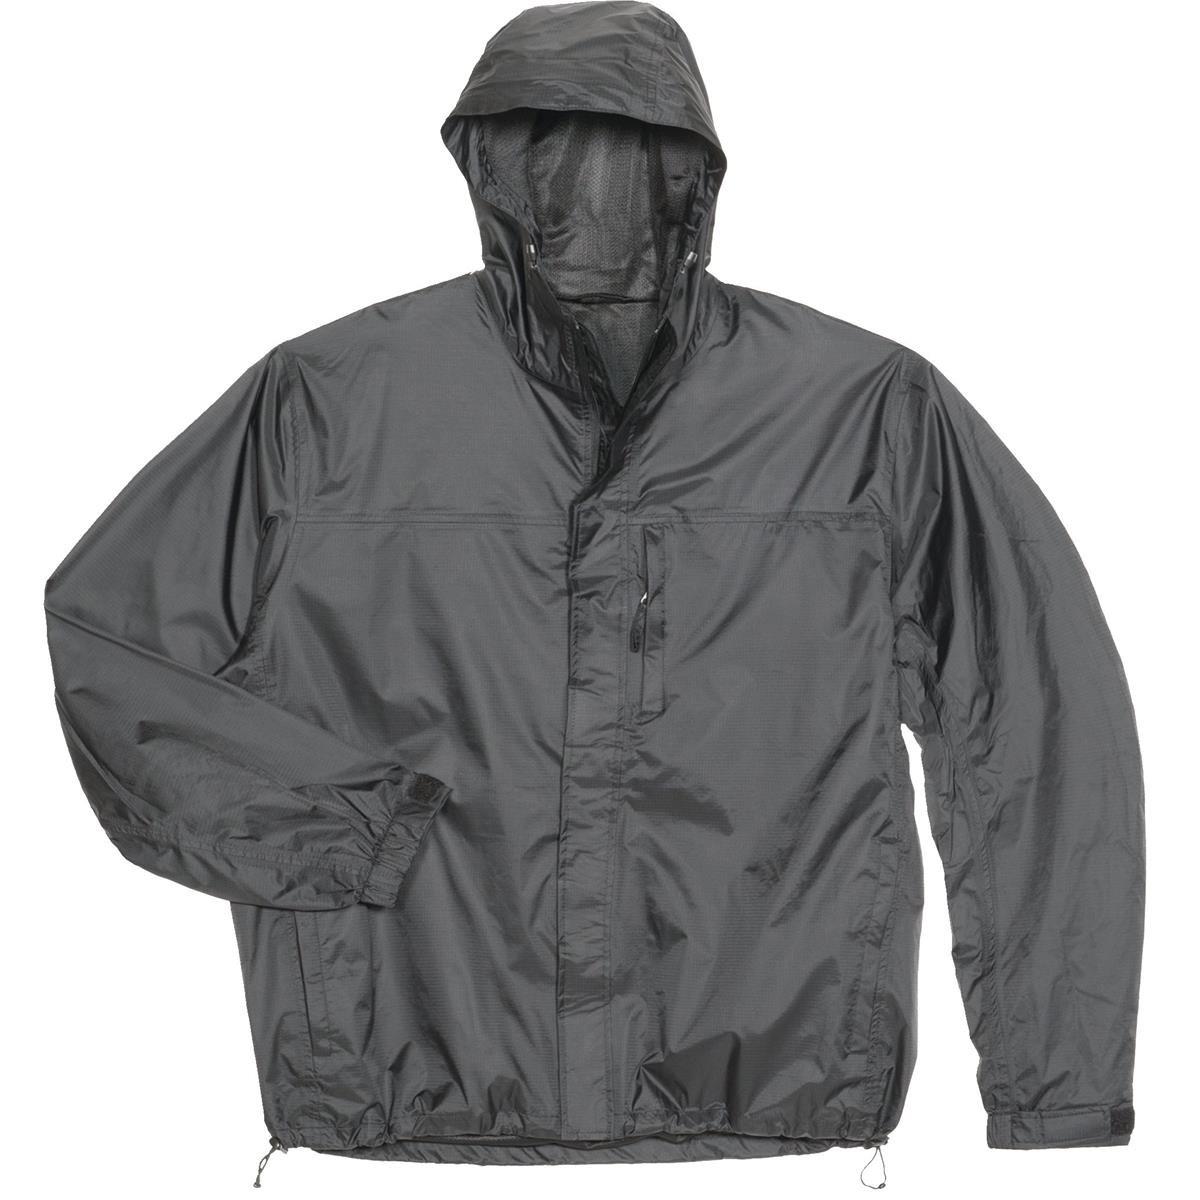 GEMPLER'S 214442 Packable Rip-Stop Rain Jacket, Black, Size 3XL by GEMPLER'S